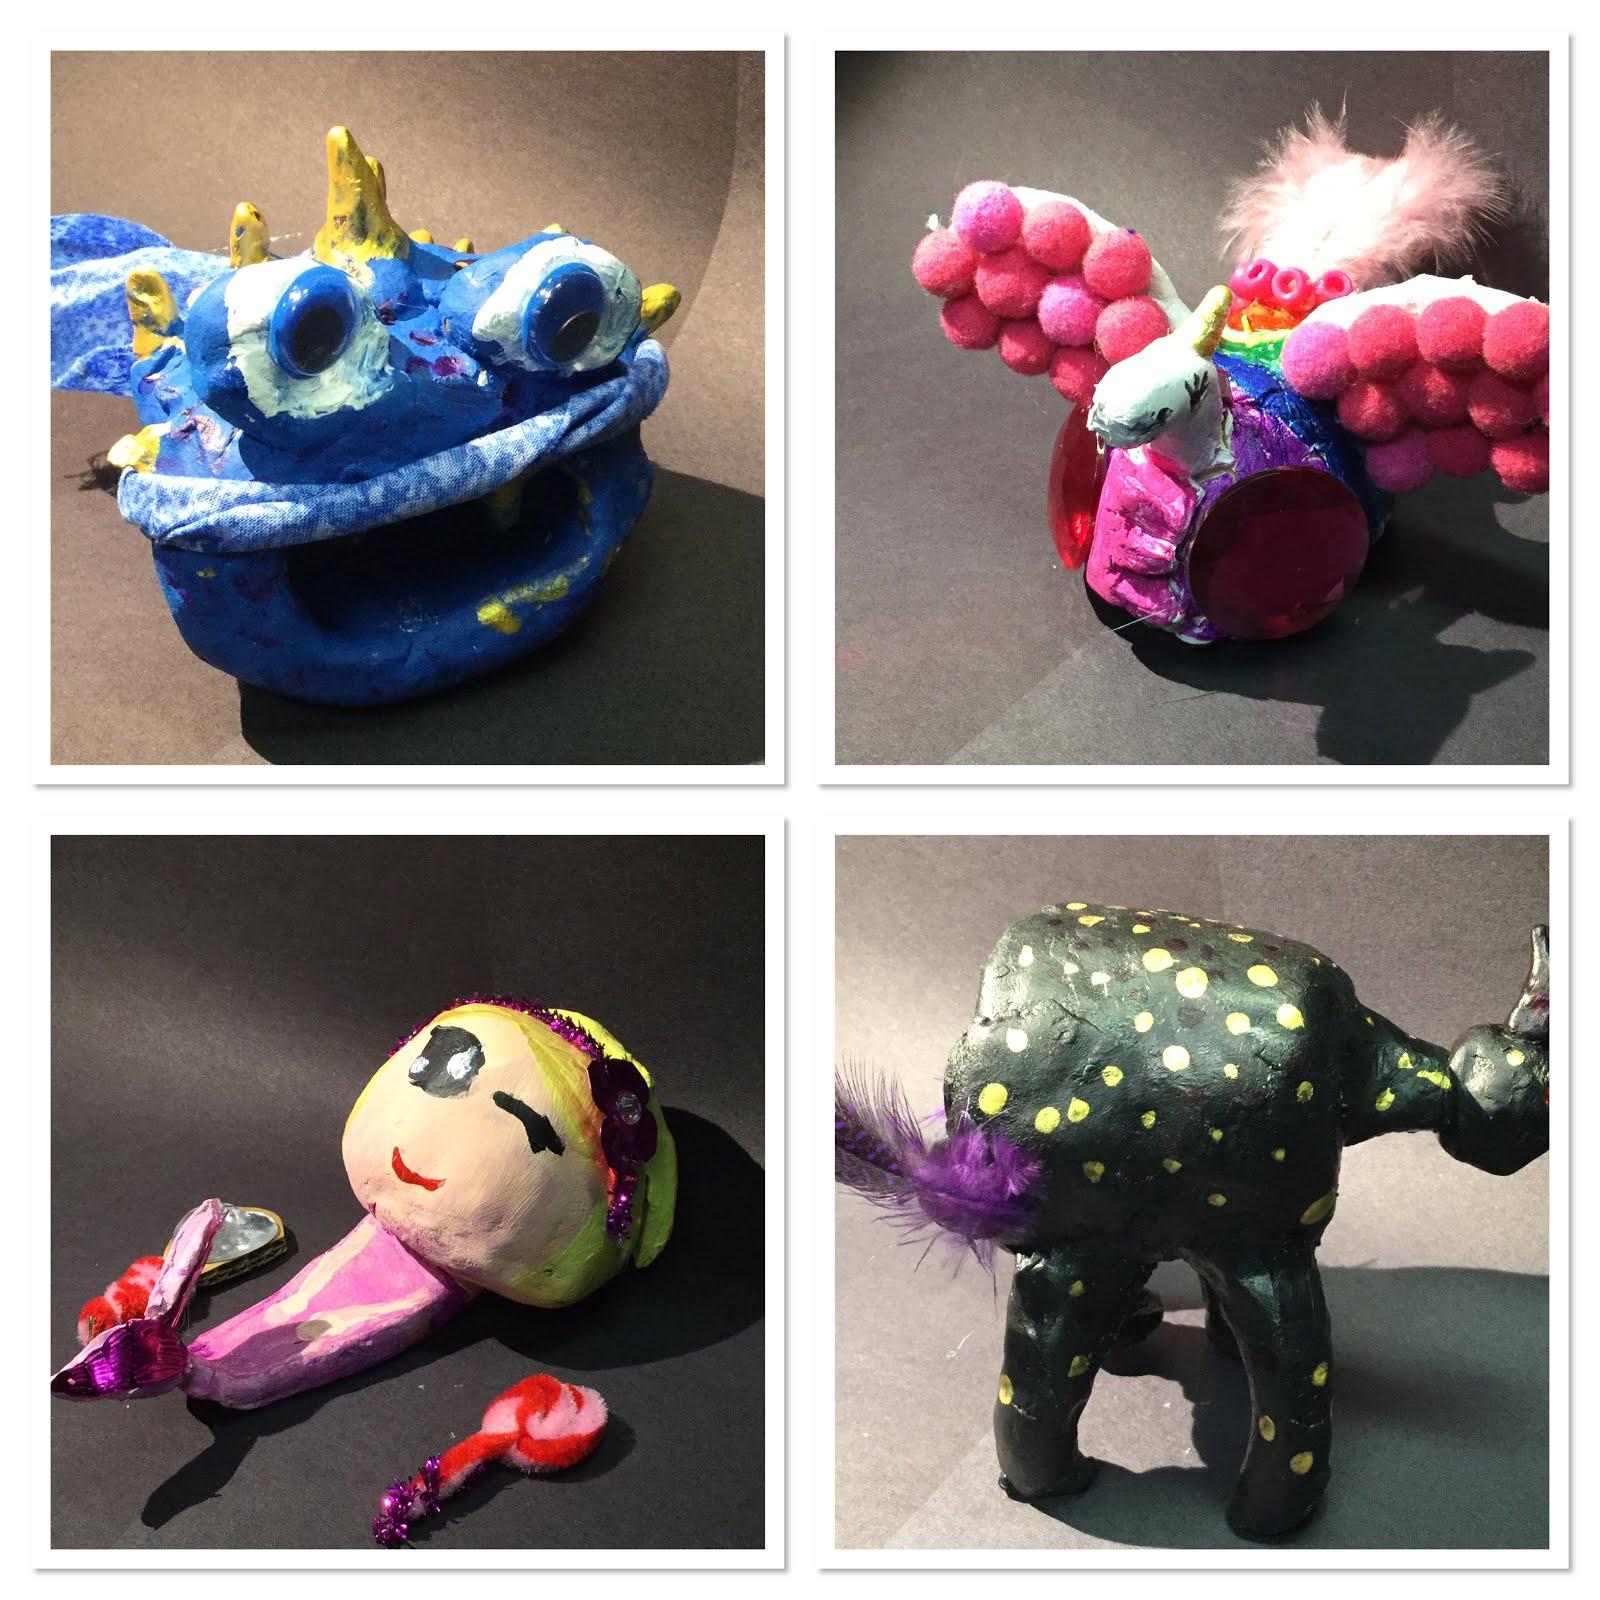 Princess Artypants: Visual Arts in the PYP